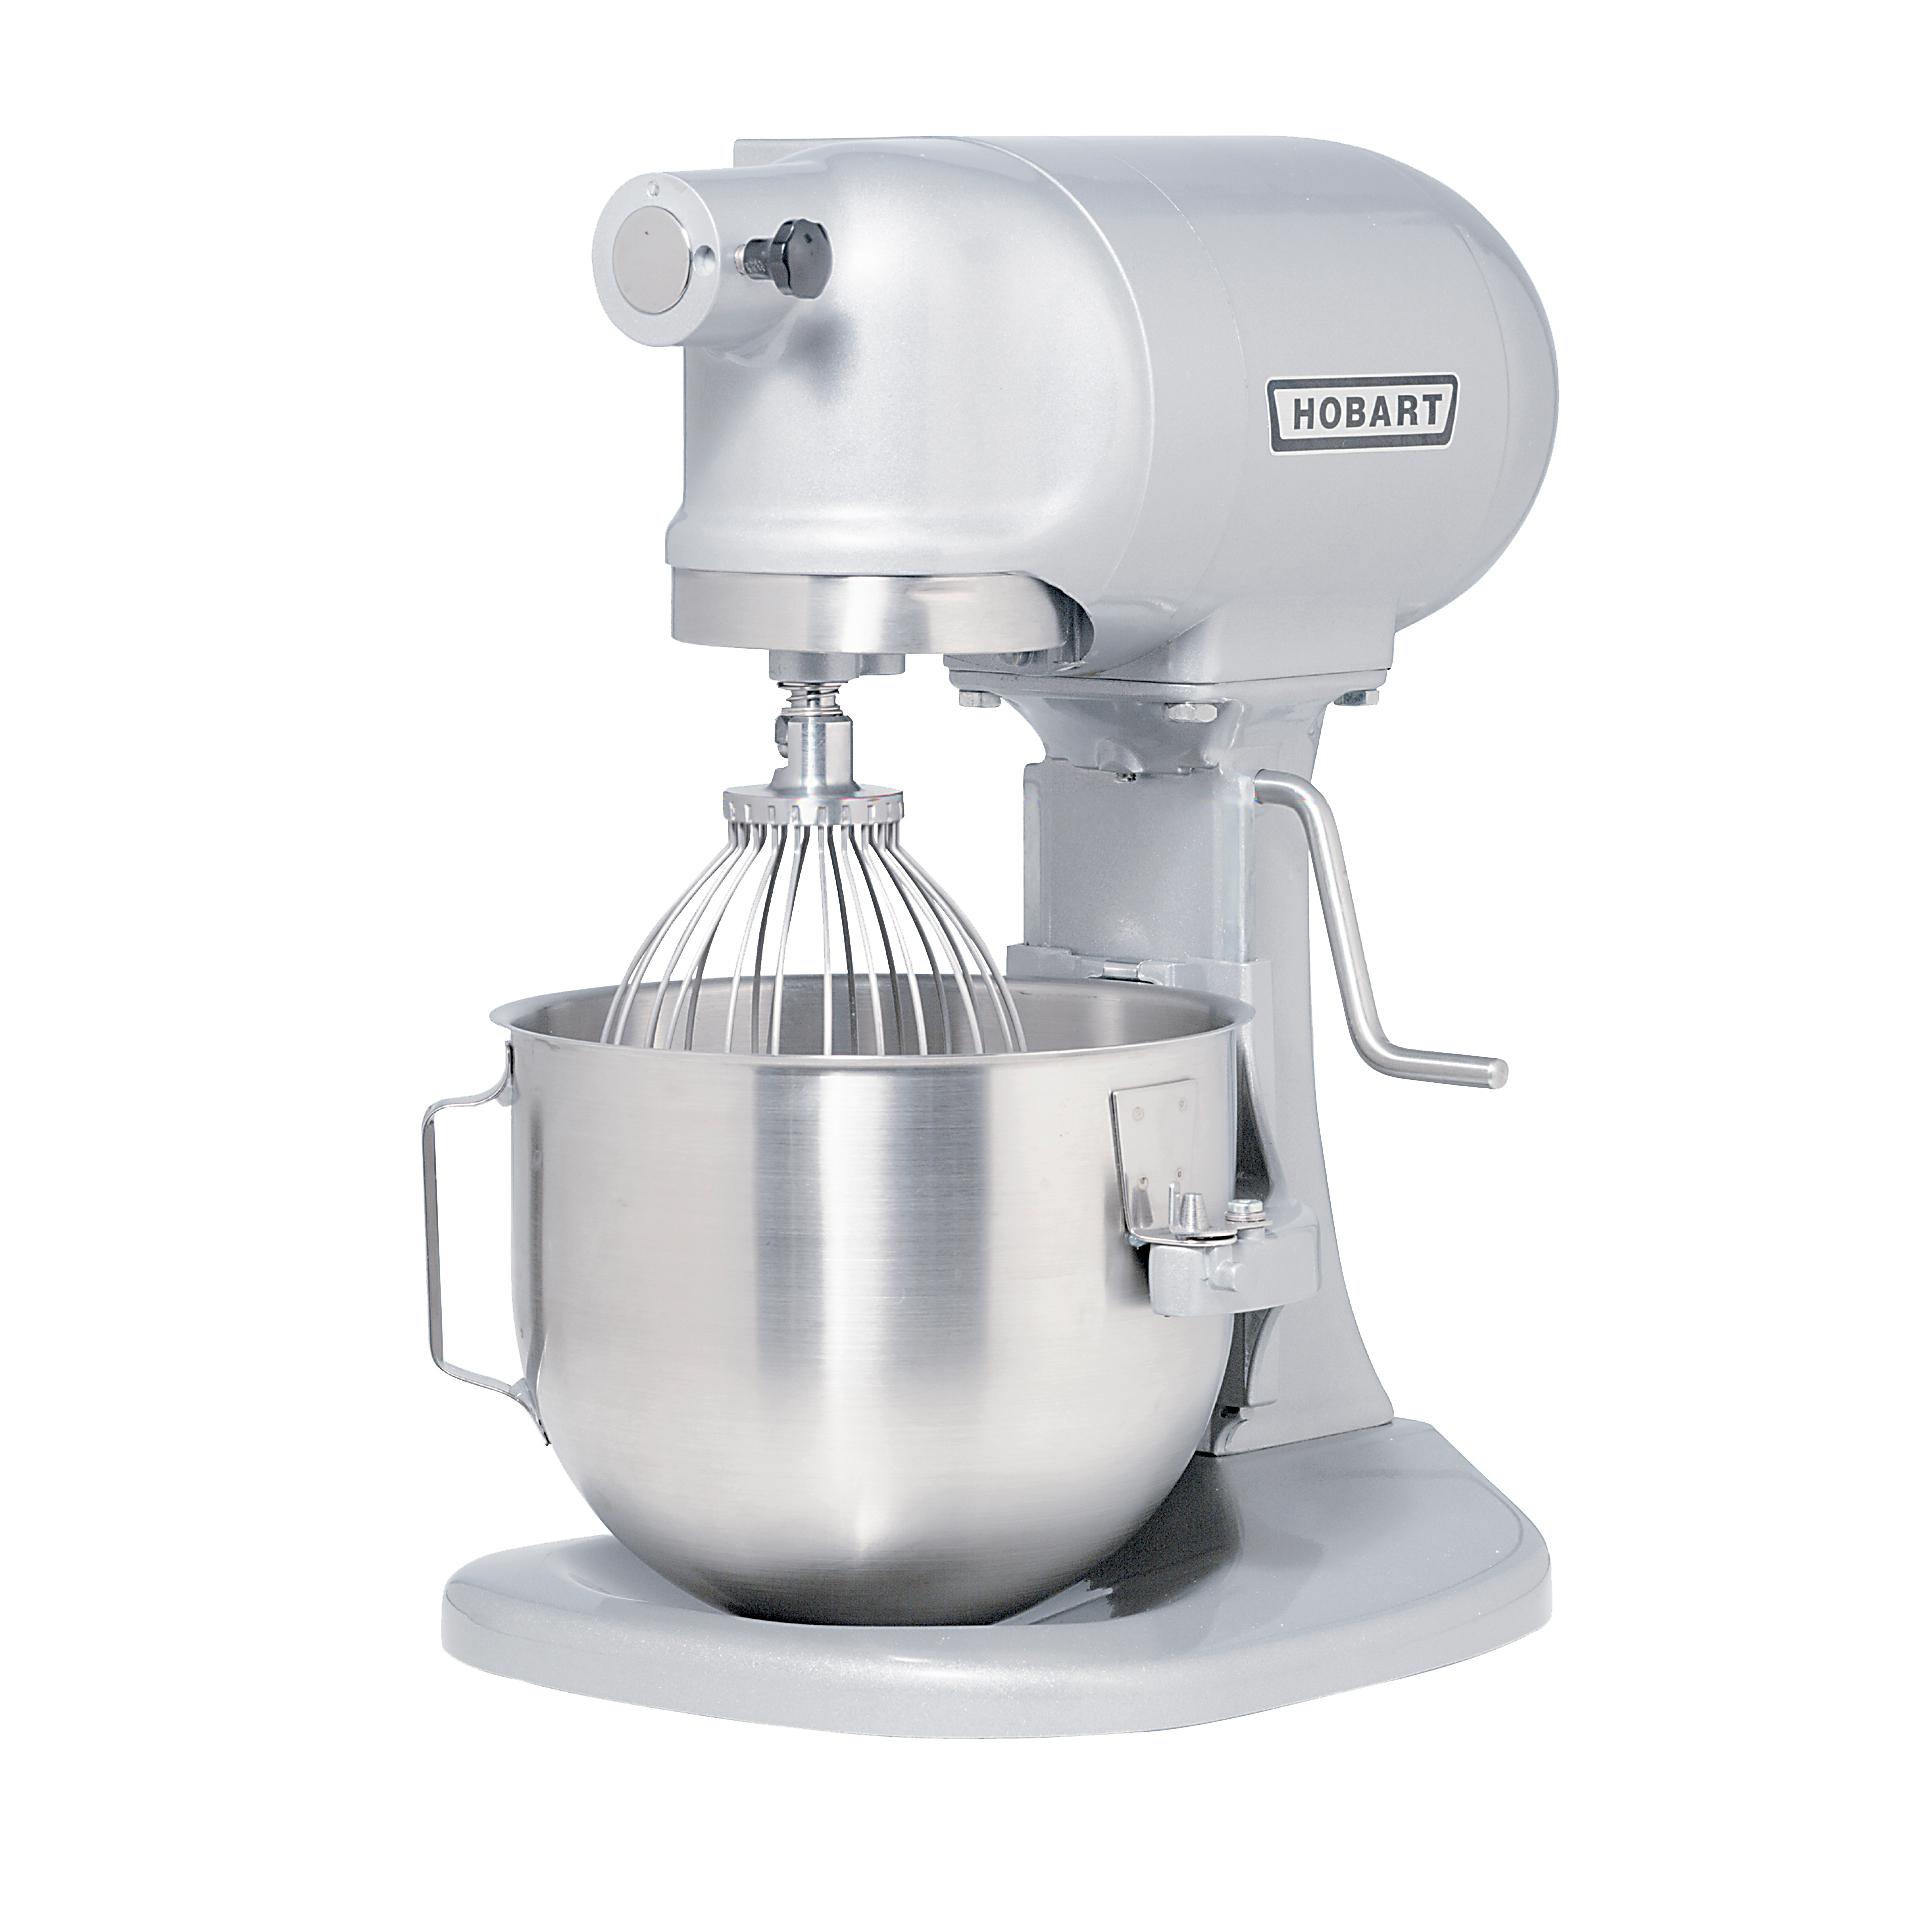 Hobart N50-651 mixer, planetary